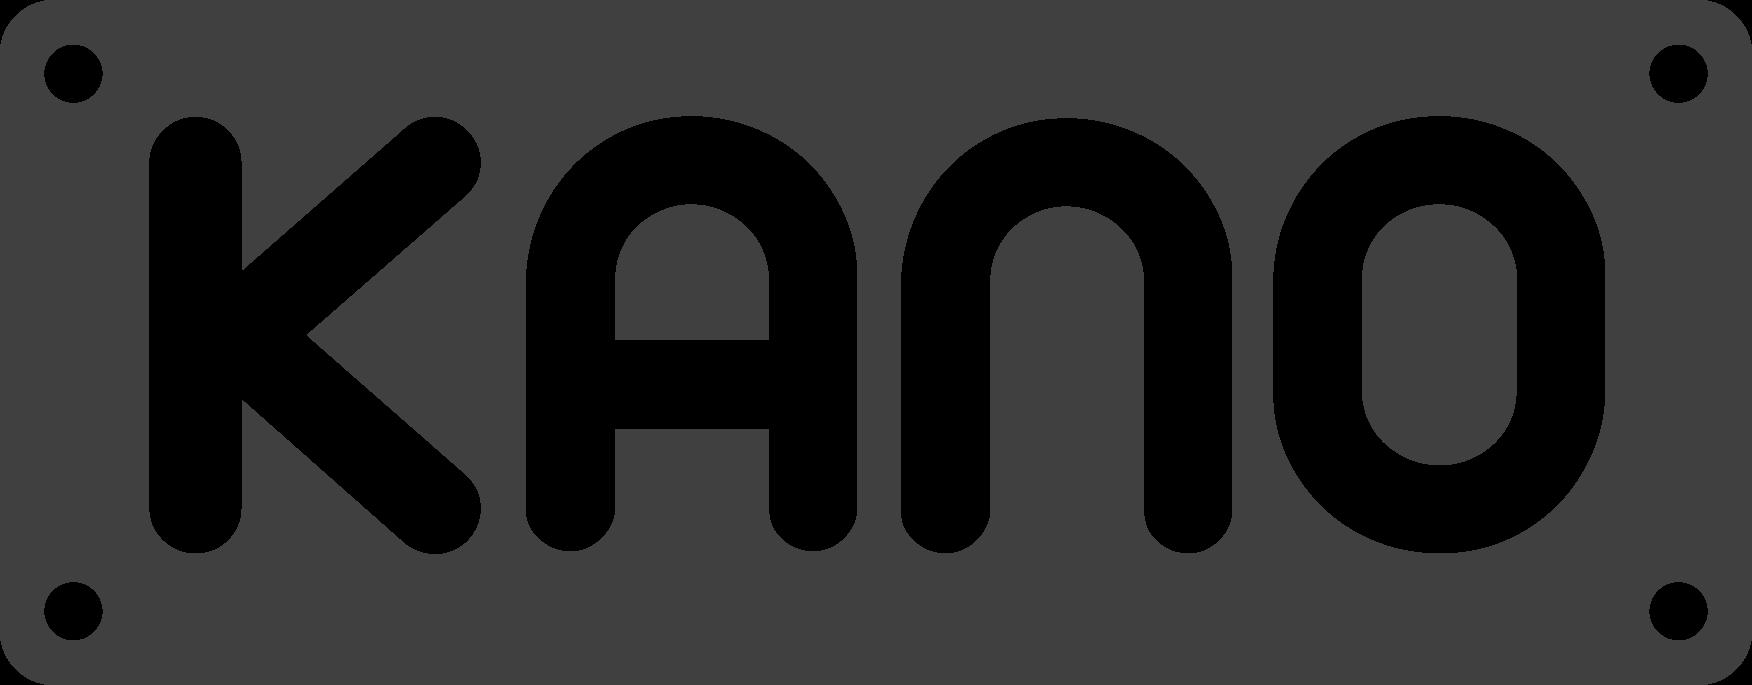 Kano black